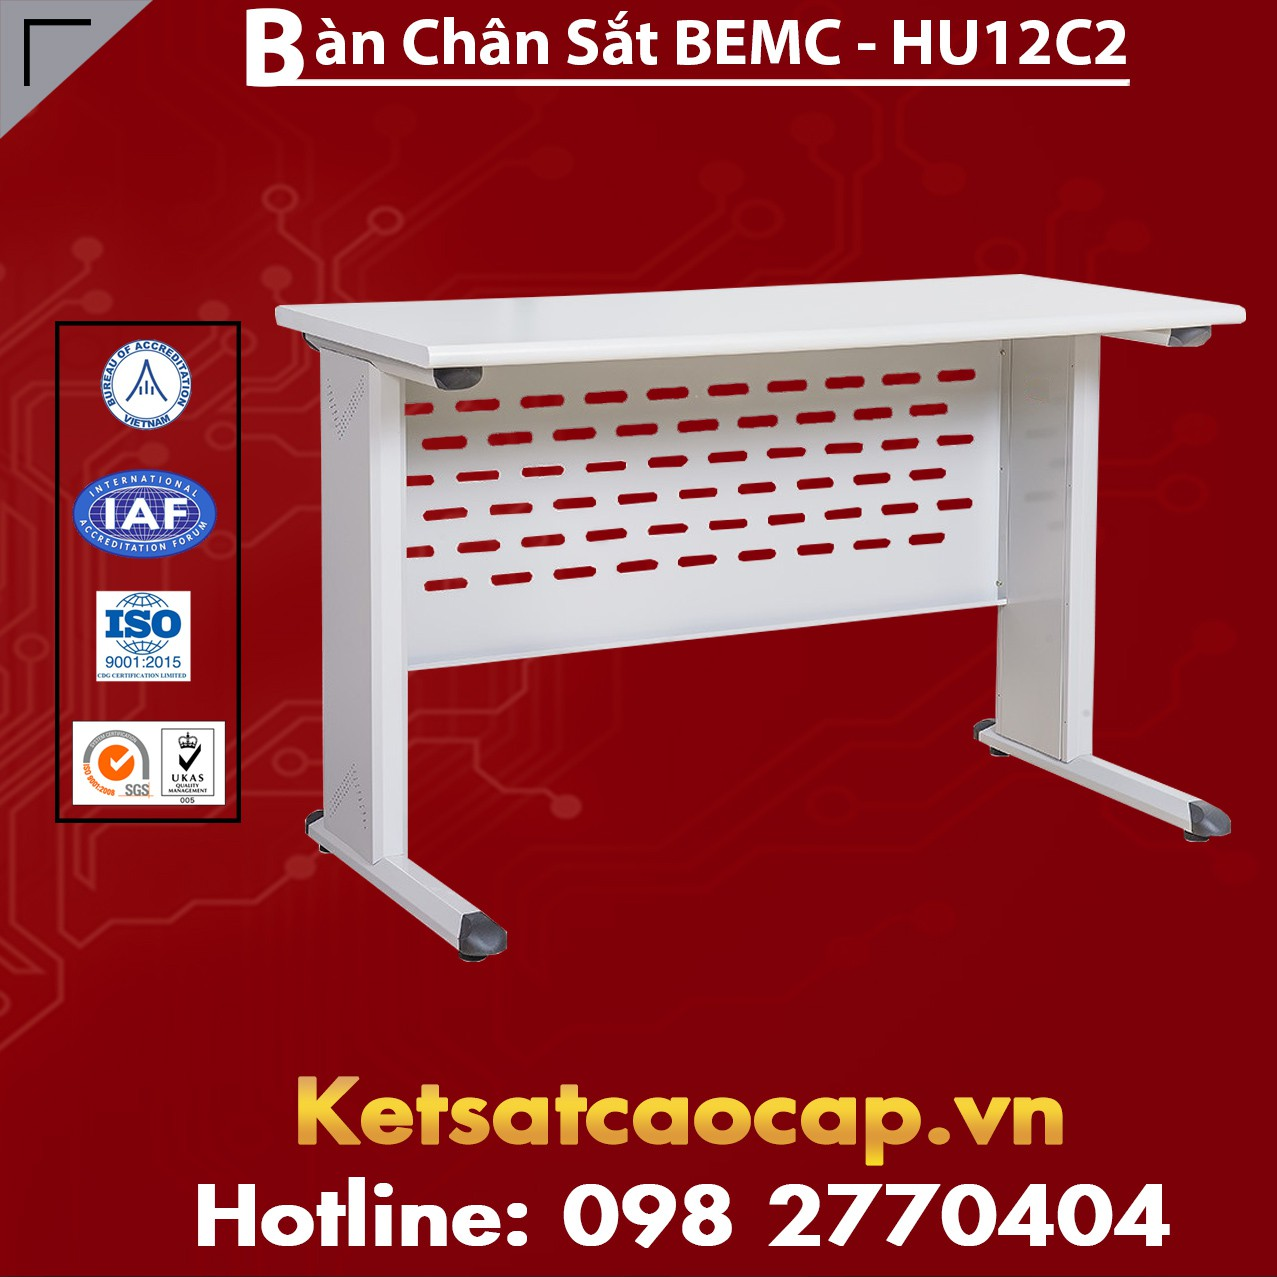 Bàn Chân Sắt BEMC - HU12C2